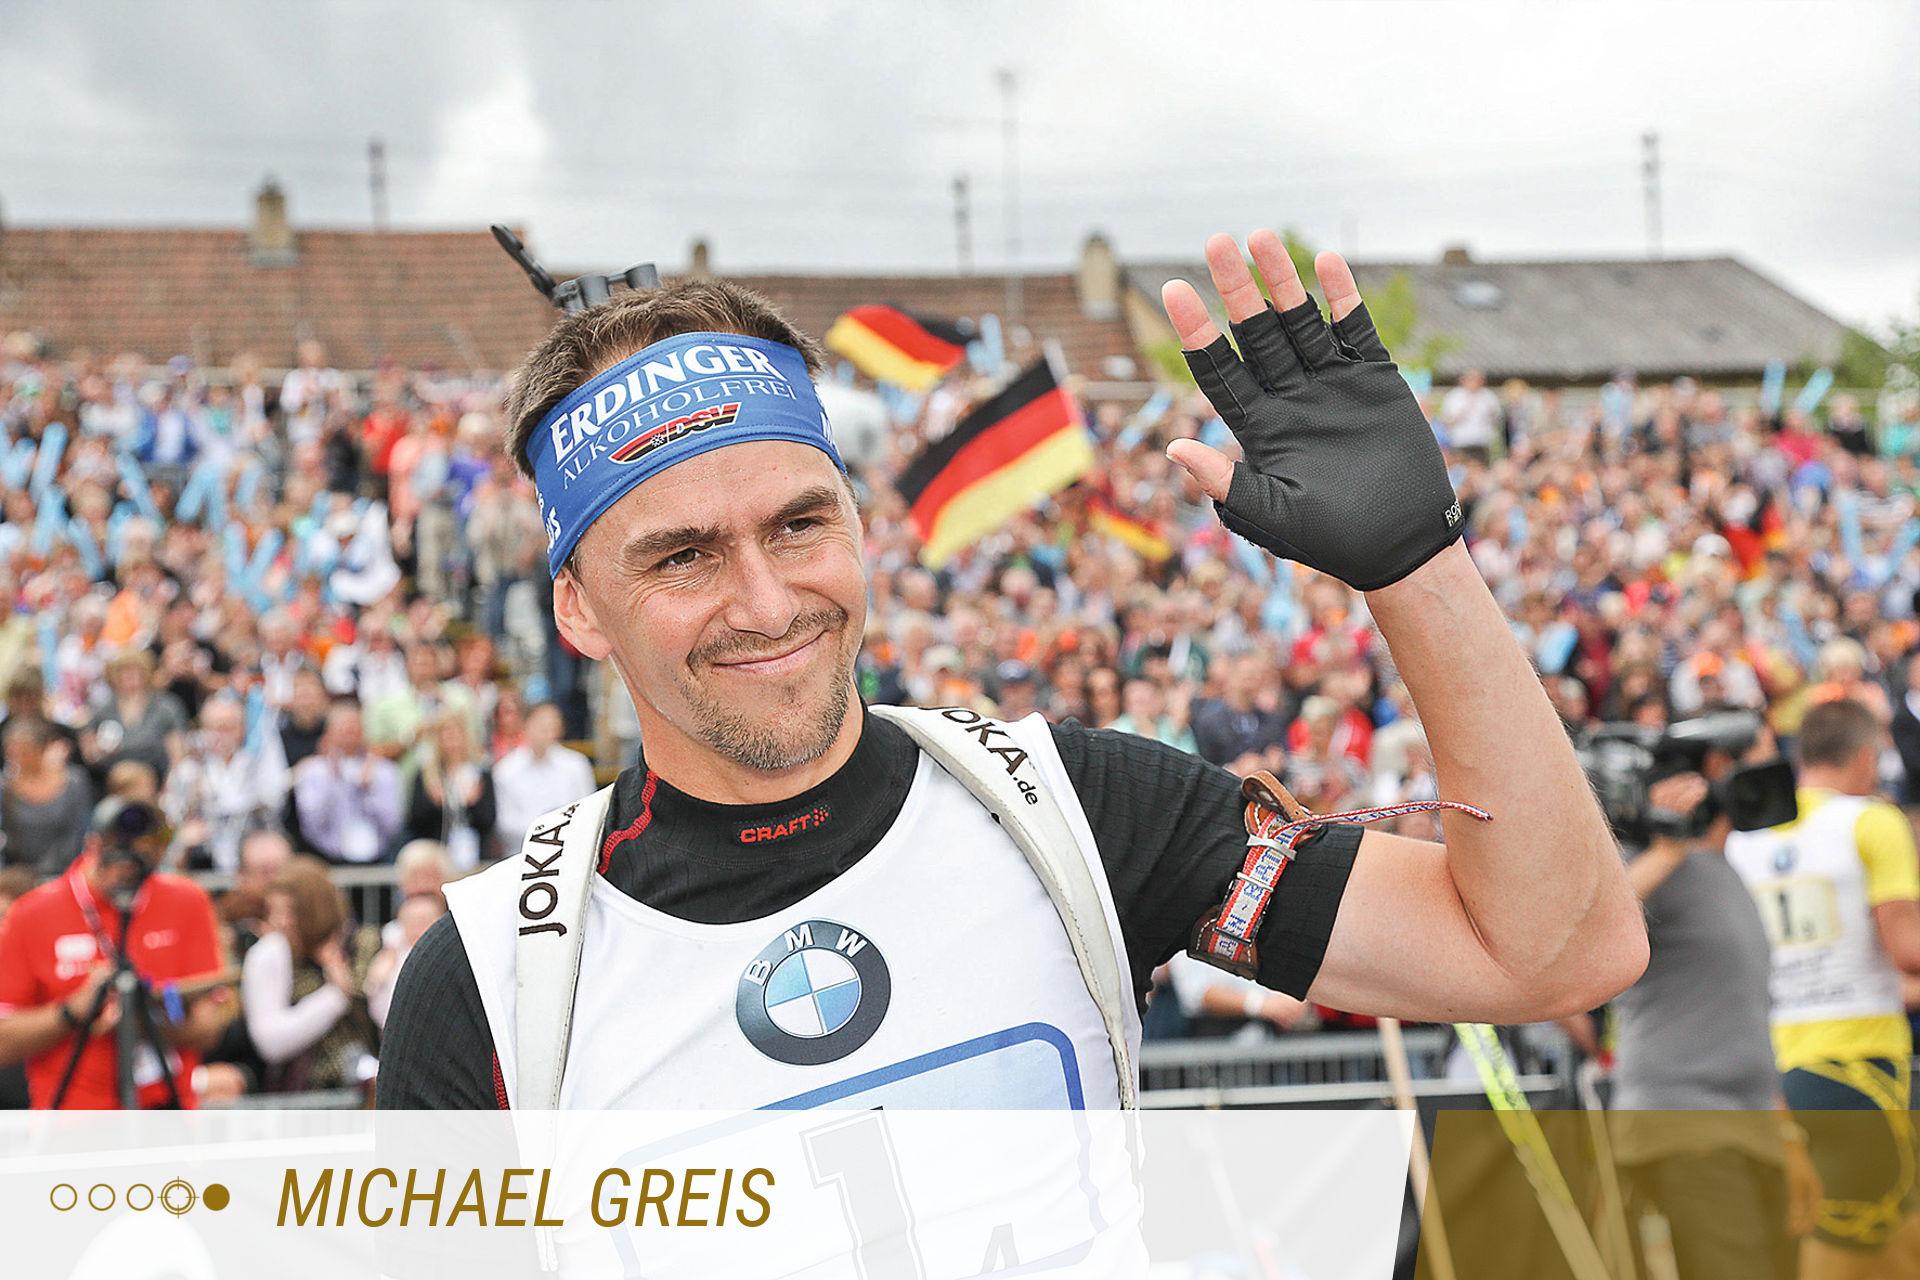 Athleten_Historie_MichaelGreis